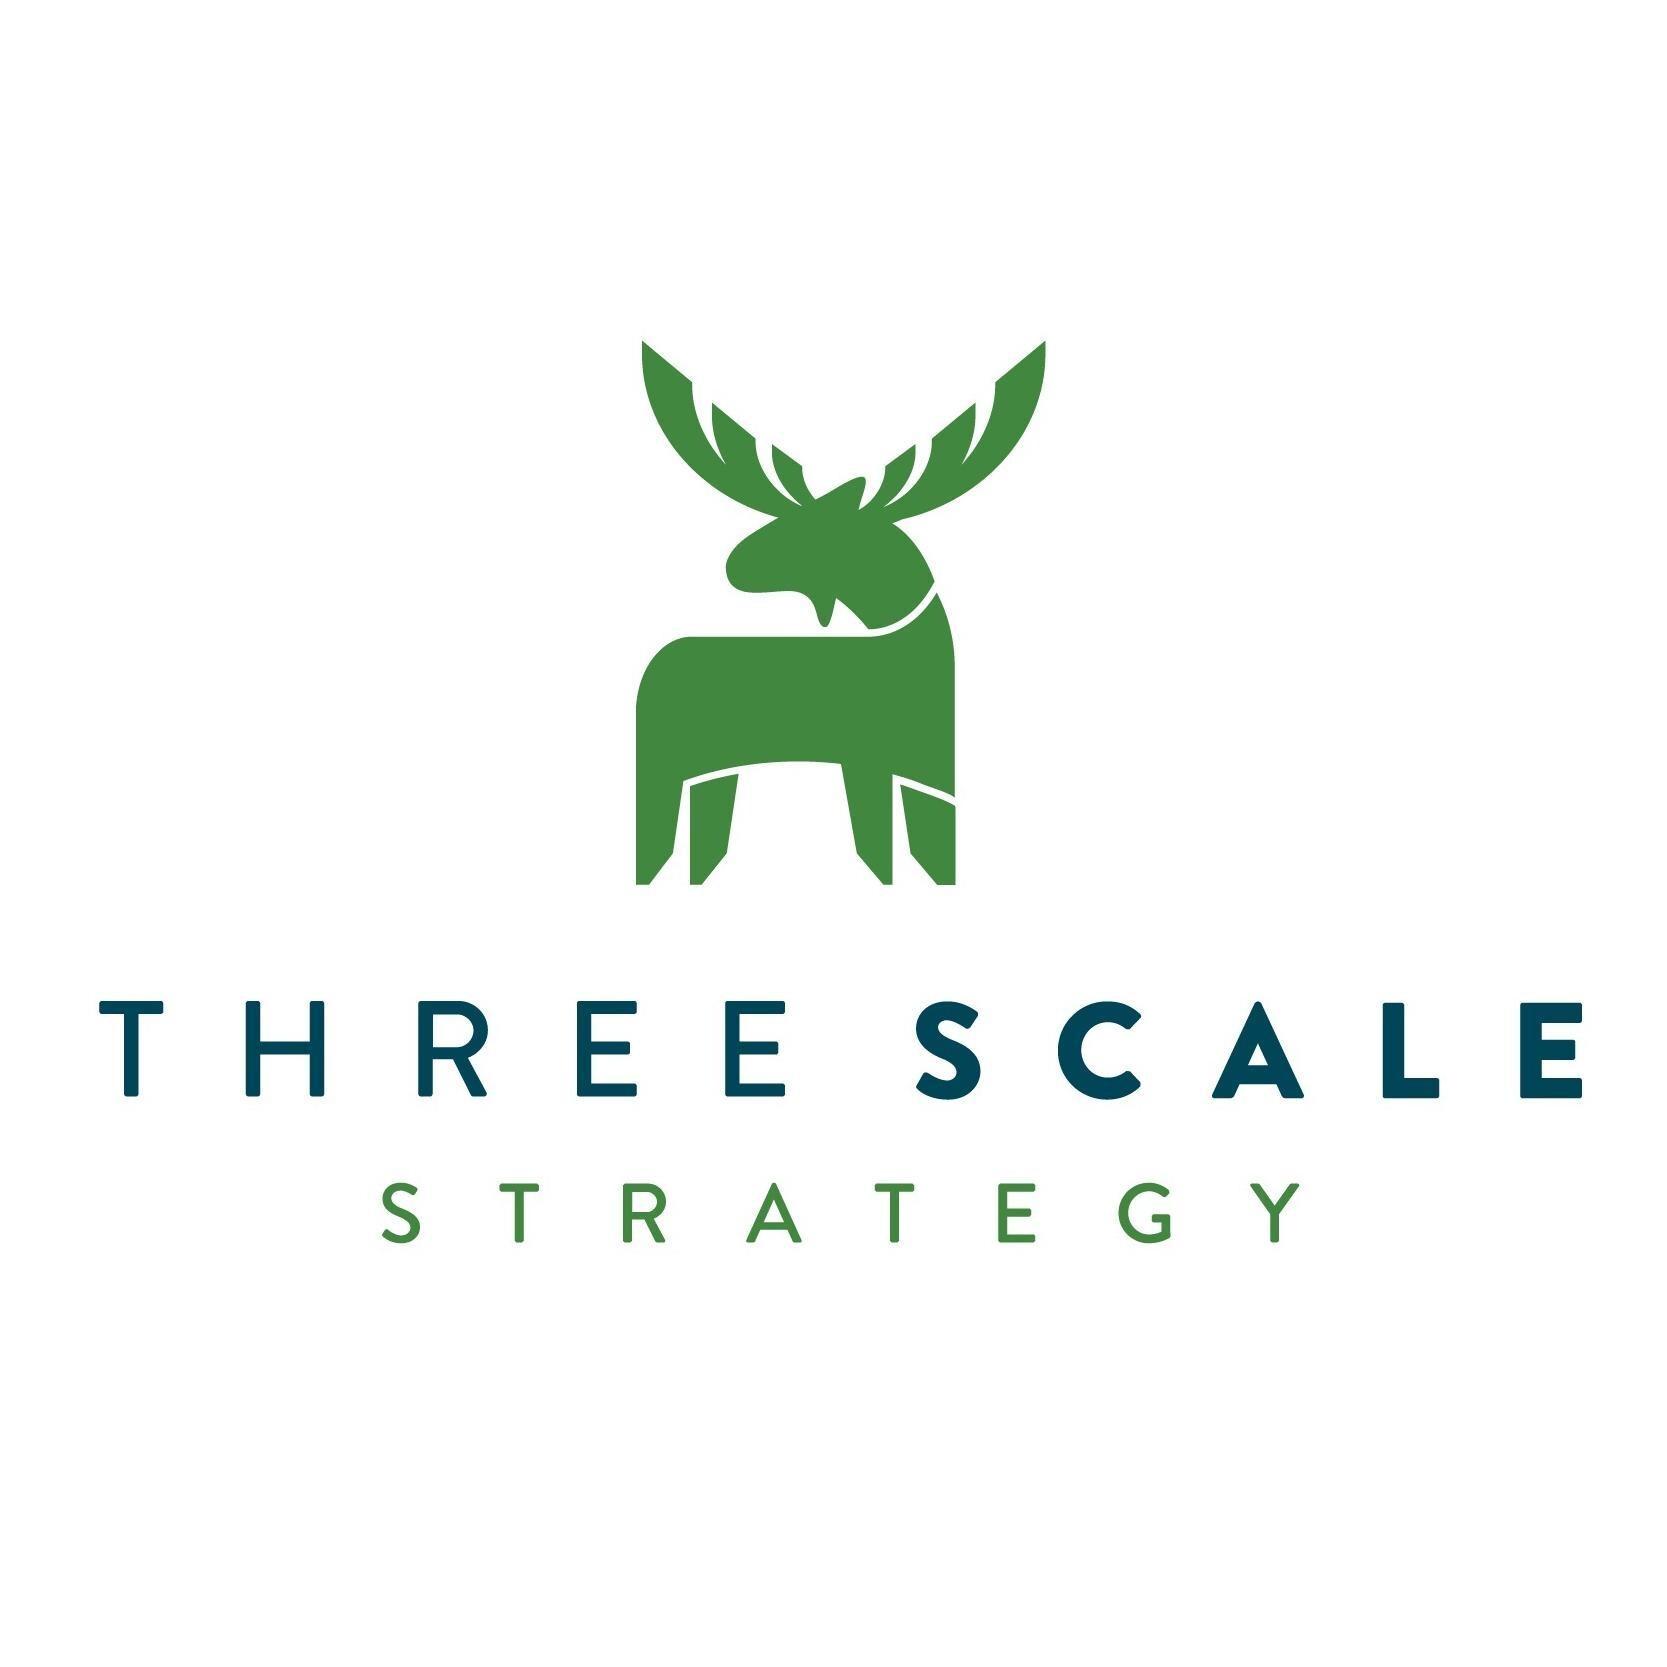 Three Scale